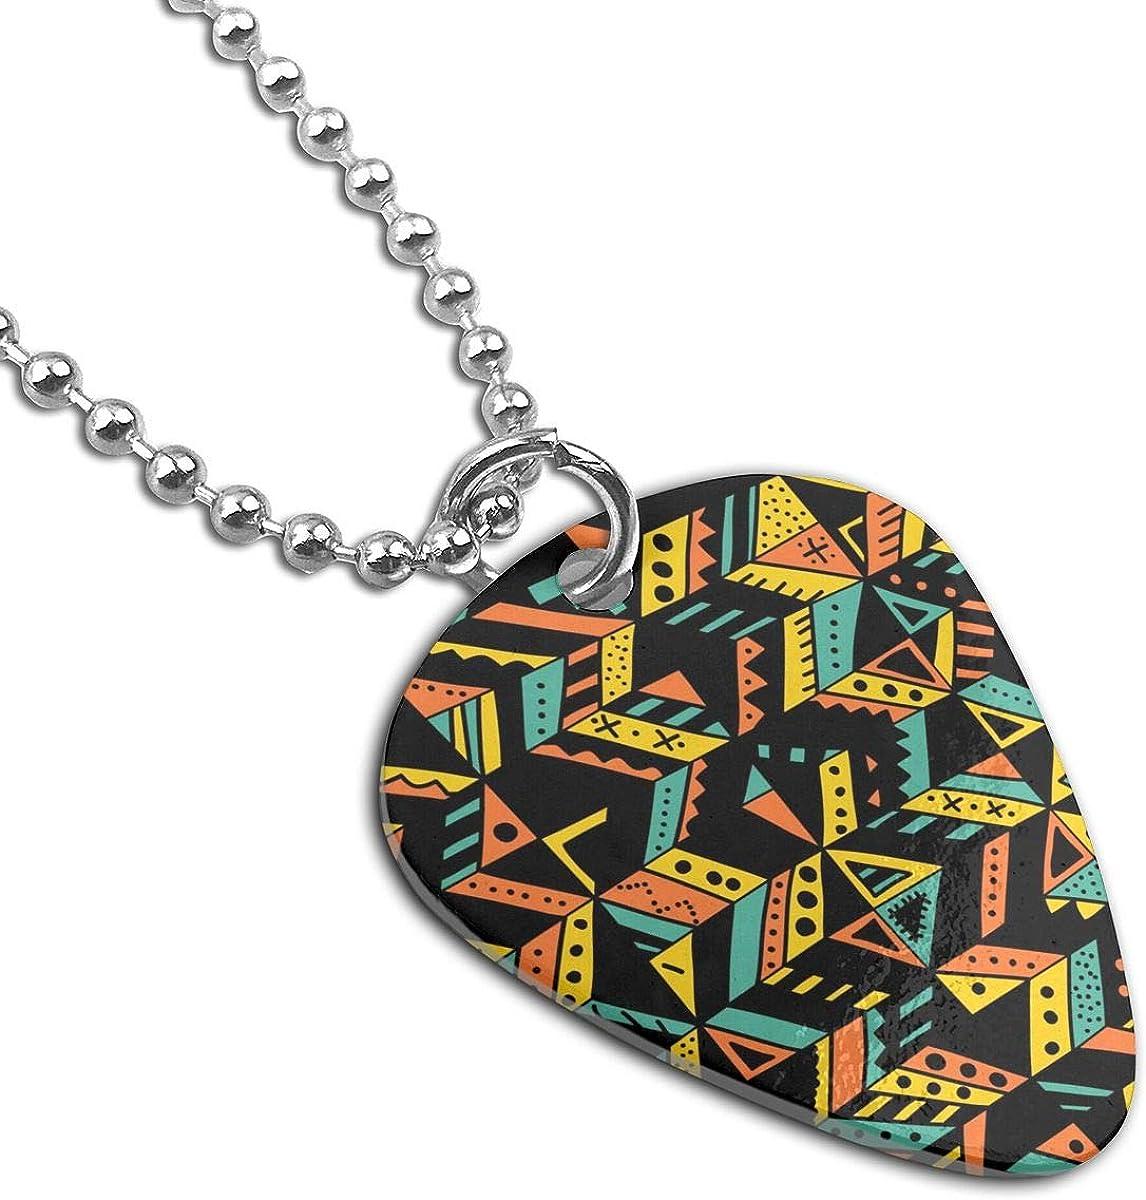 Tribal Trendy Ornaments Custom Guitar Pick Pendant Necklace Keychain